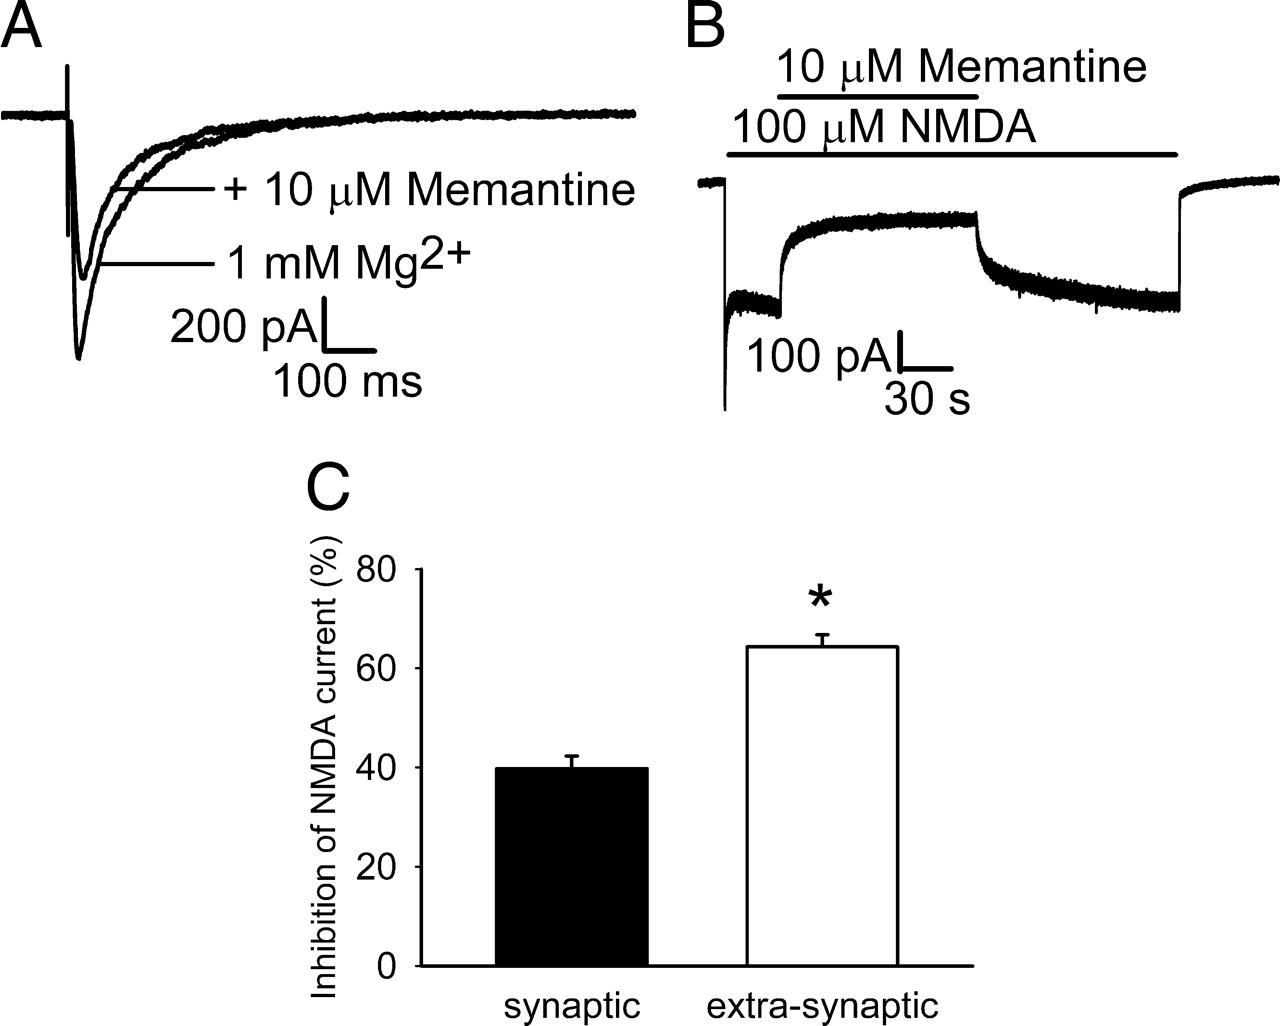 Memantine Preferentially Blocks Extrasynaptic over